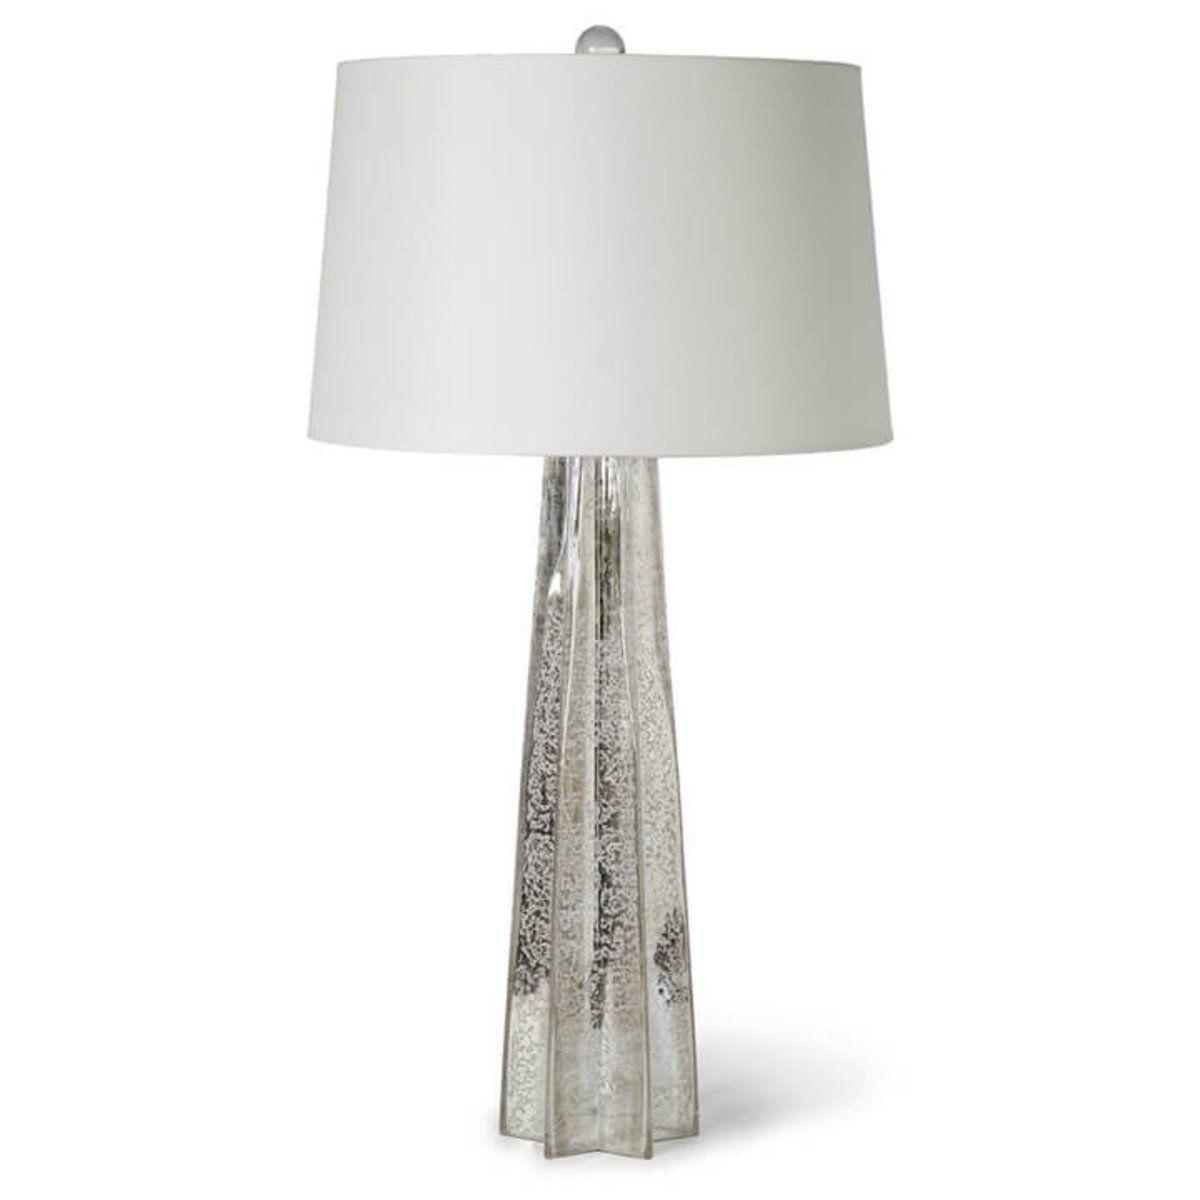 fbx lamps cgtrader molecule model lamp furniture brass obj mtl max models andrew regina